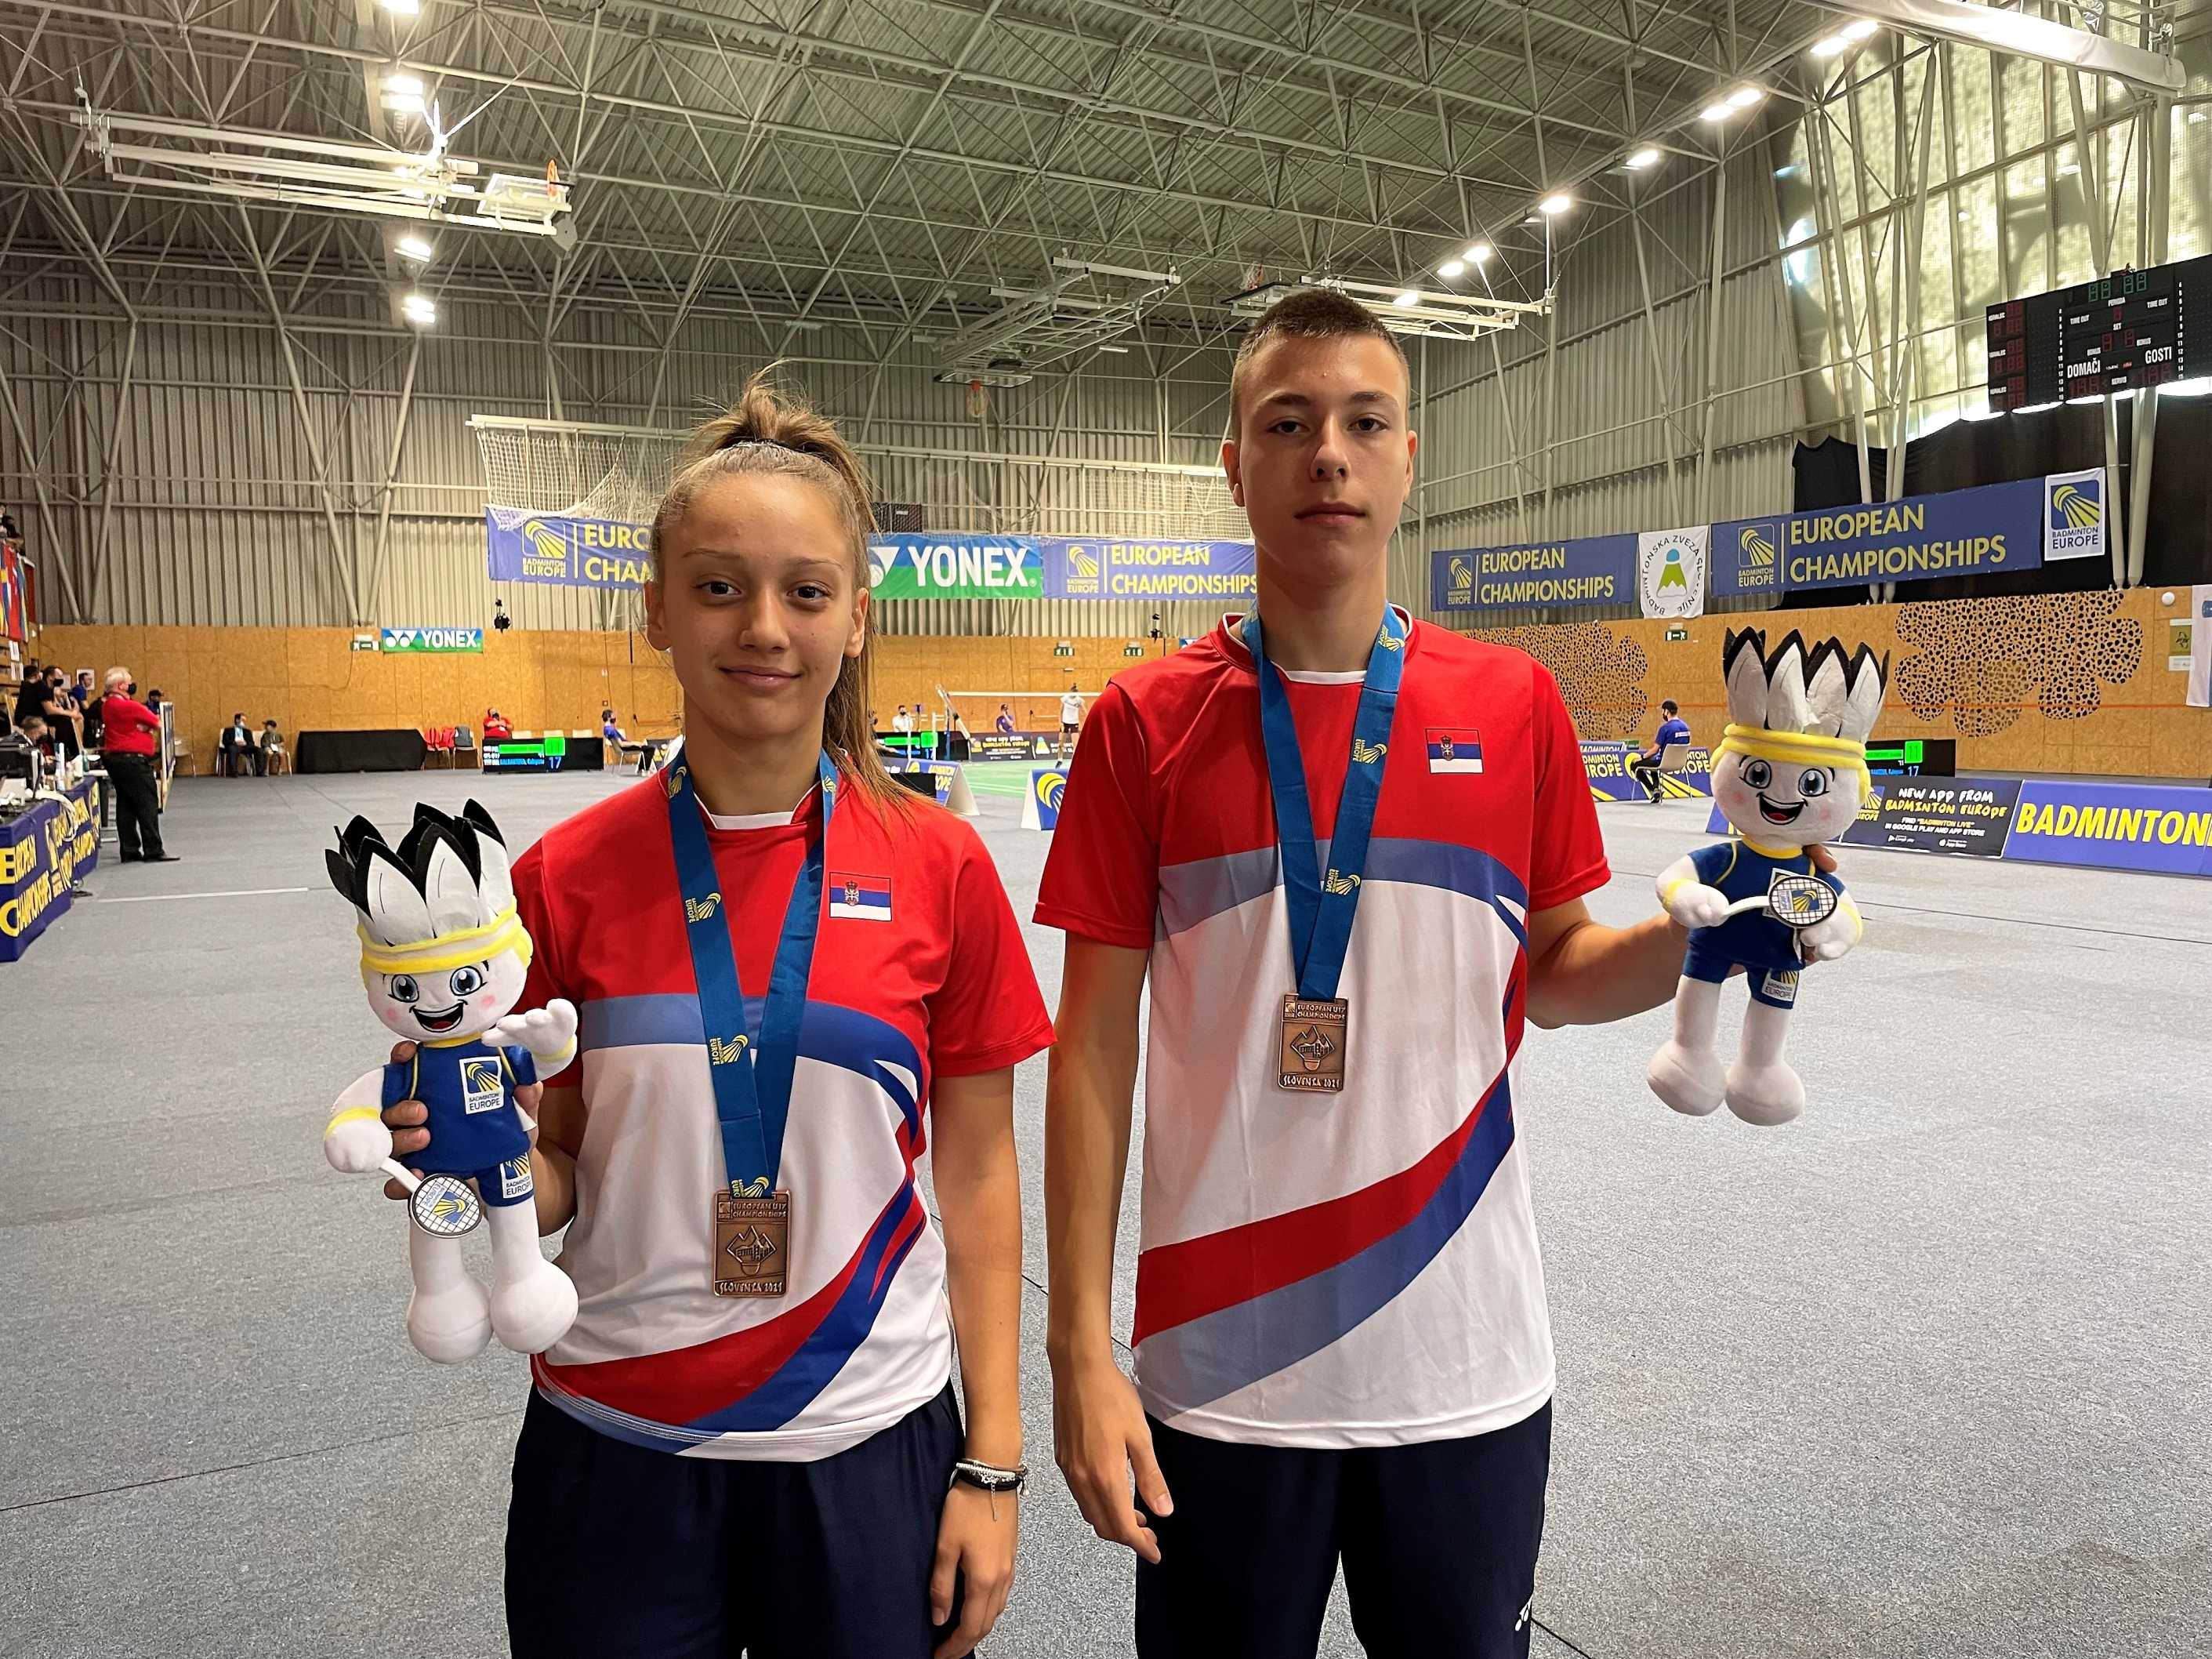 Kruševačkom badmintonisti Viktoru Petroviću bronzana medalja na Evropskom prvenstvu!